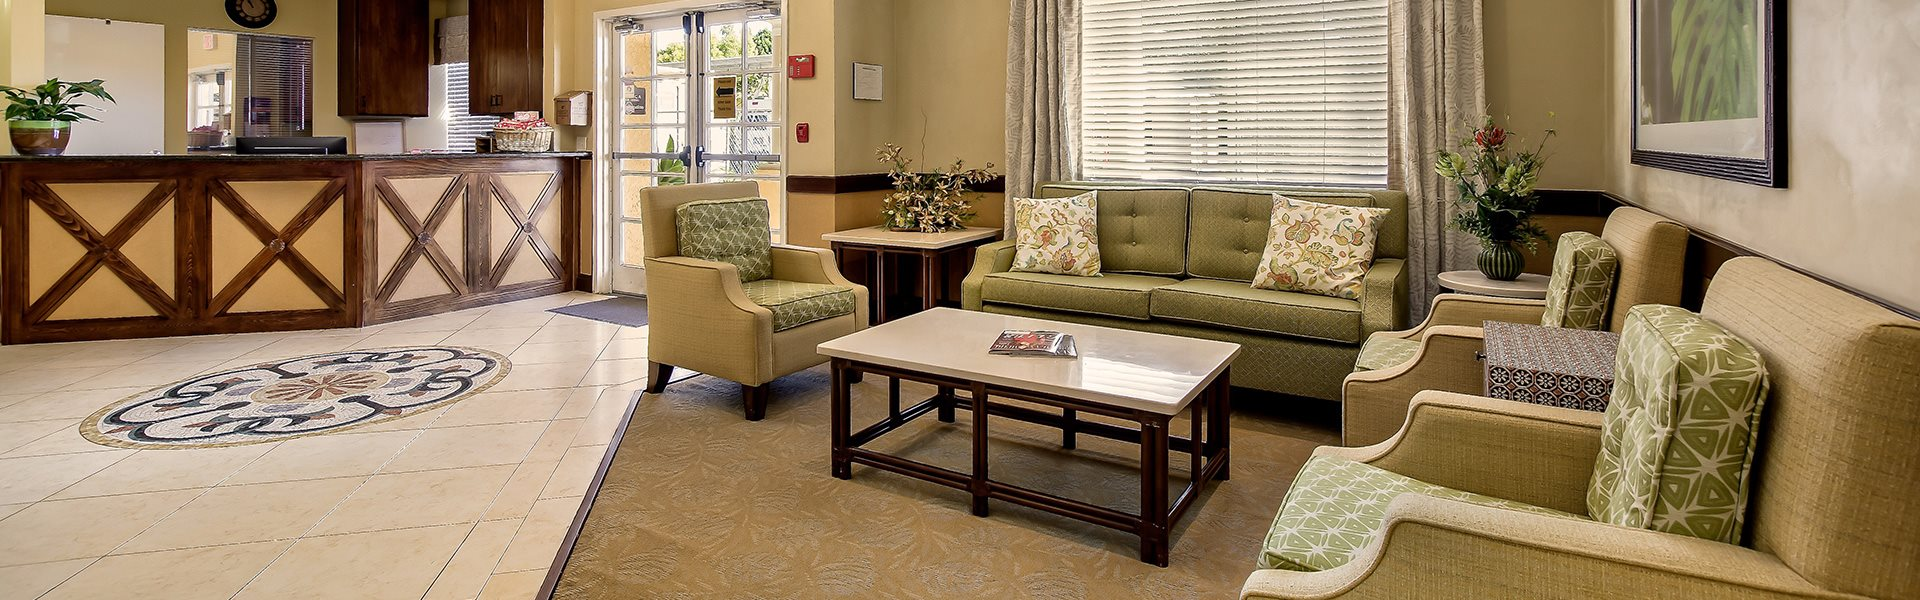 Graceful Furnished Activity Room at Pacifica Senior Living: Riverside Legacies Memory Care, Riverside, 92509